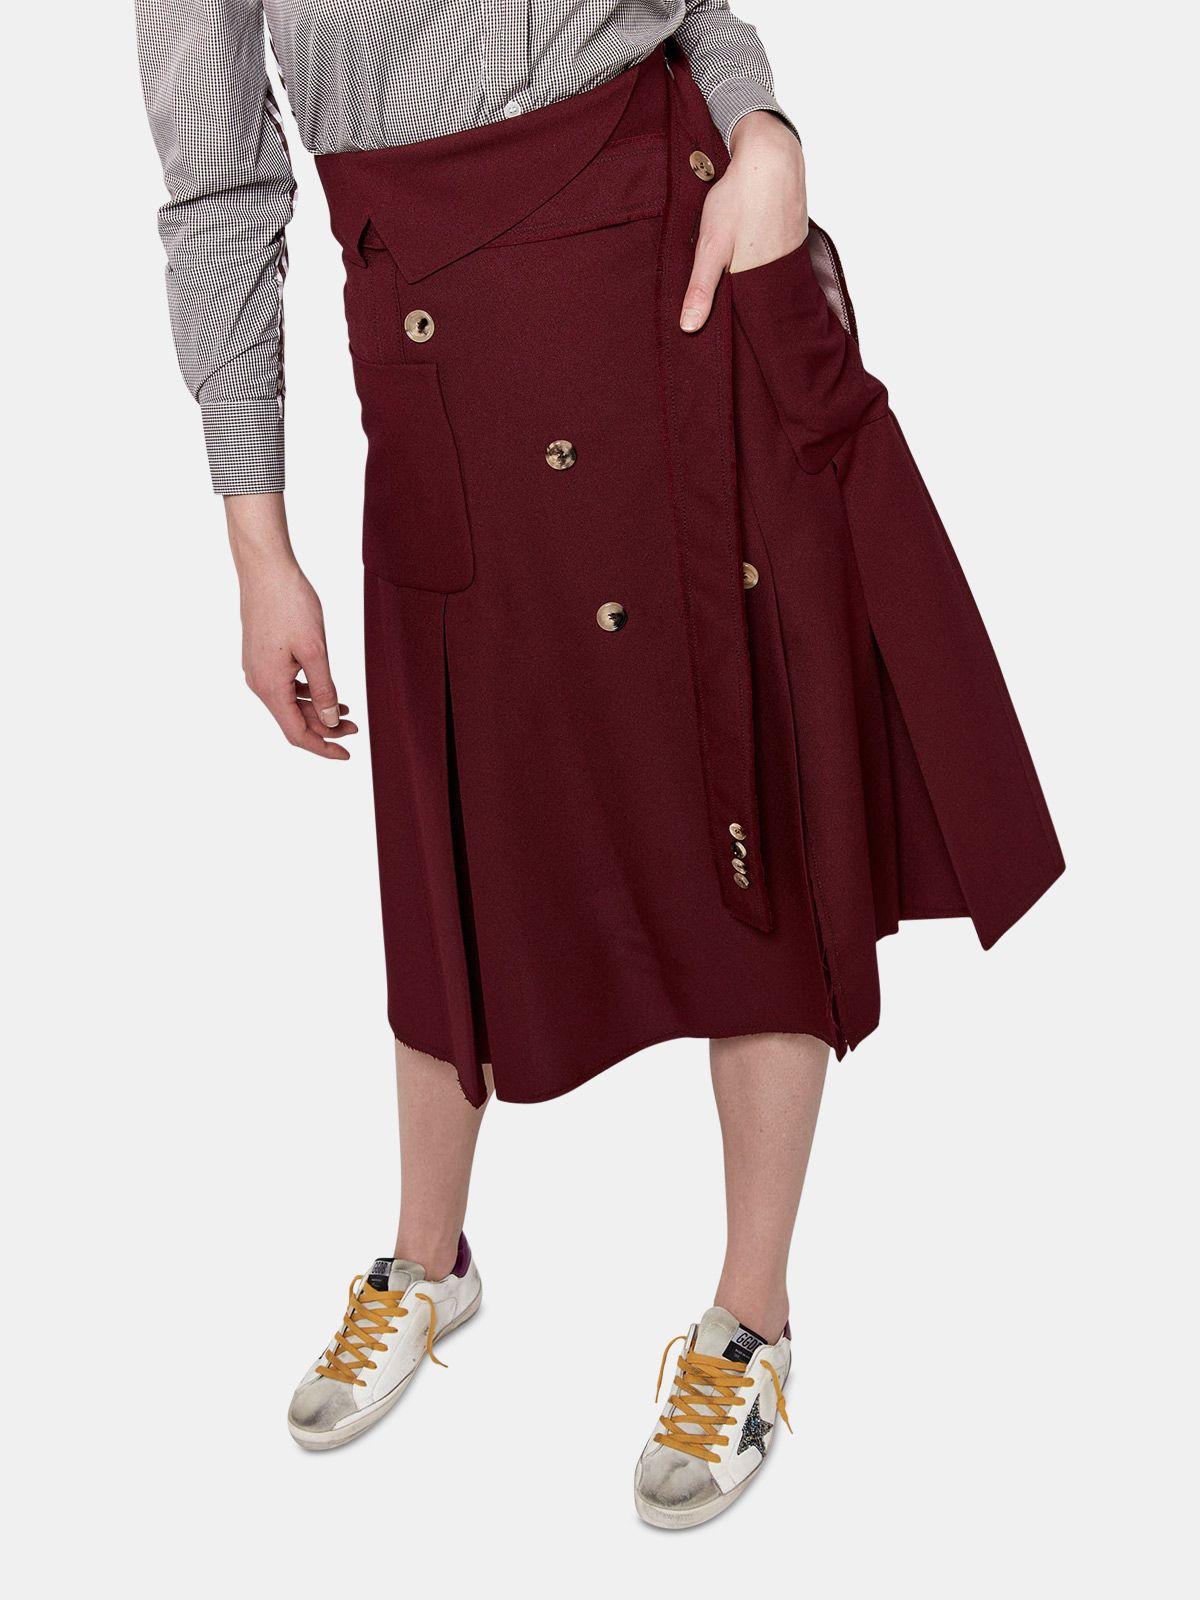 Golden Goose - Makiko skirt in technical fabric in